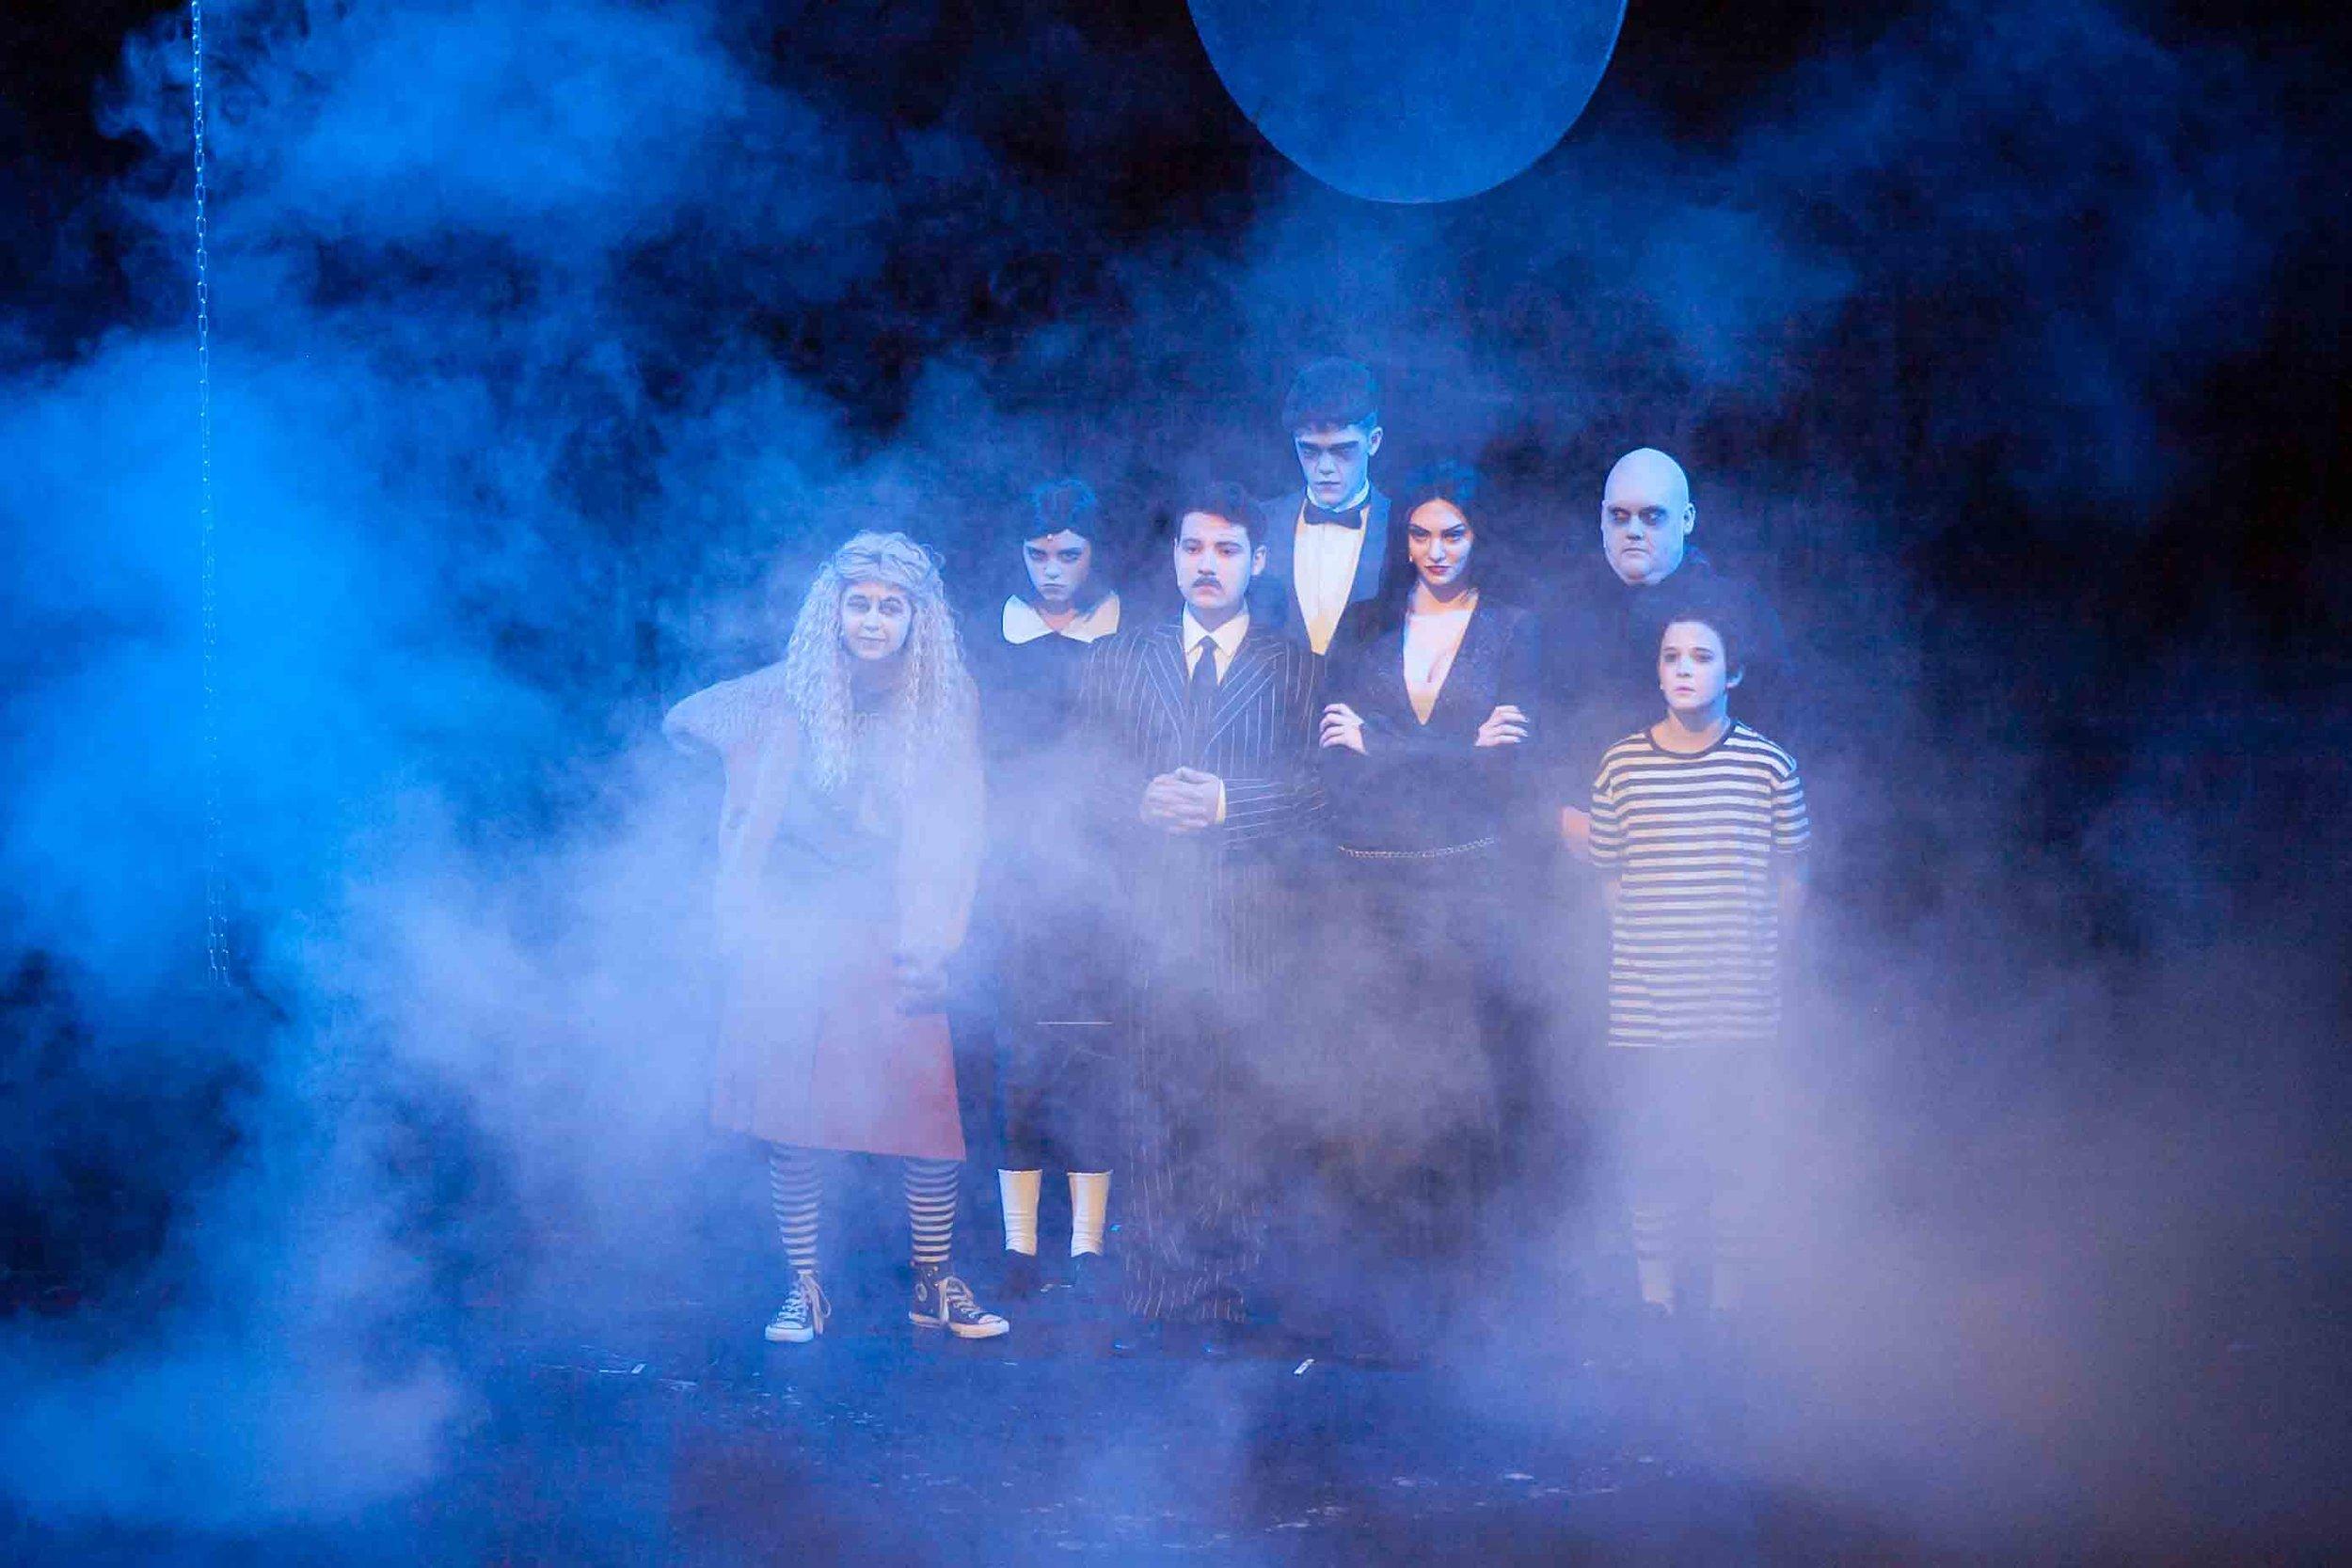 6-19-16 Addams Family Kooky Cast 0012.jpg